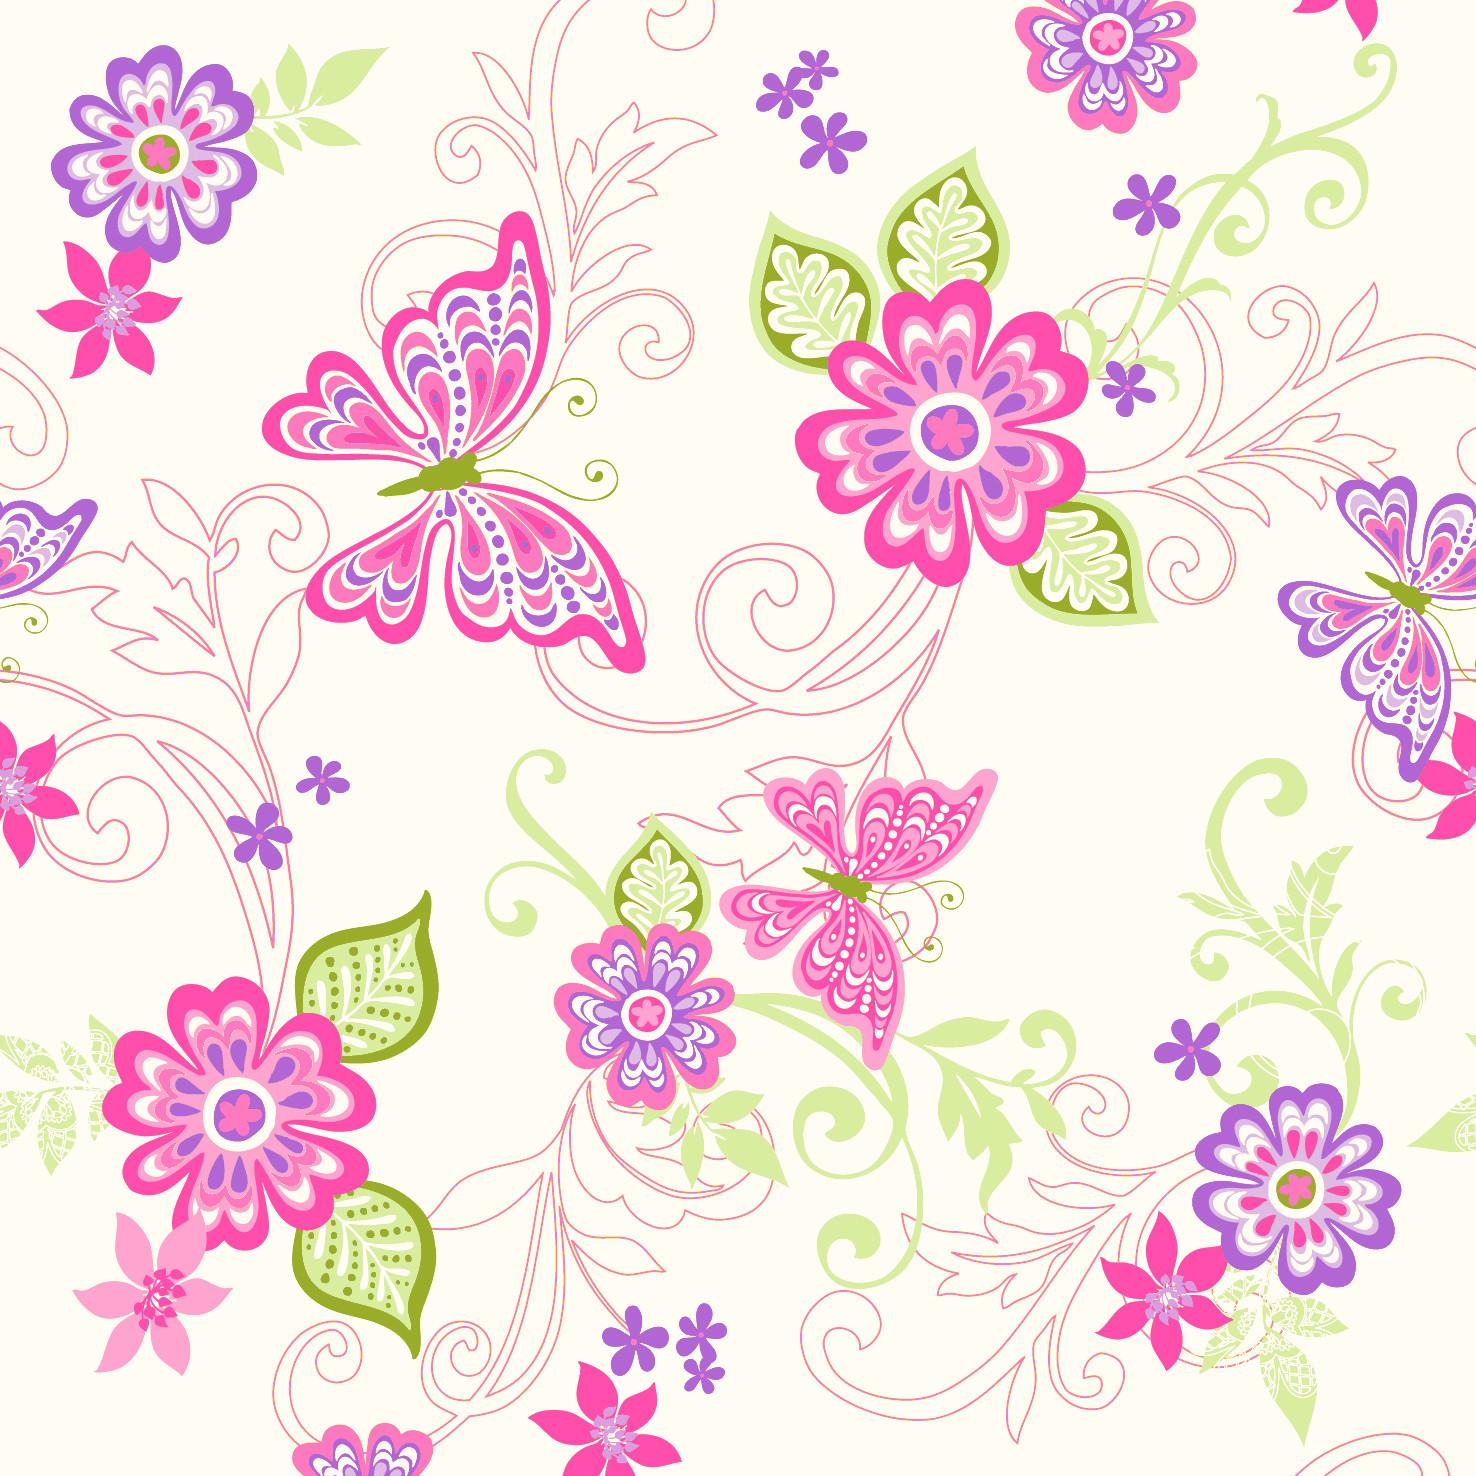 Free download cheap wallpaper borderwallpaper flower